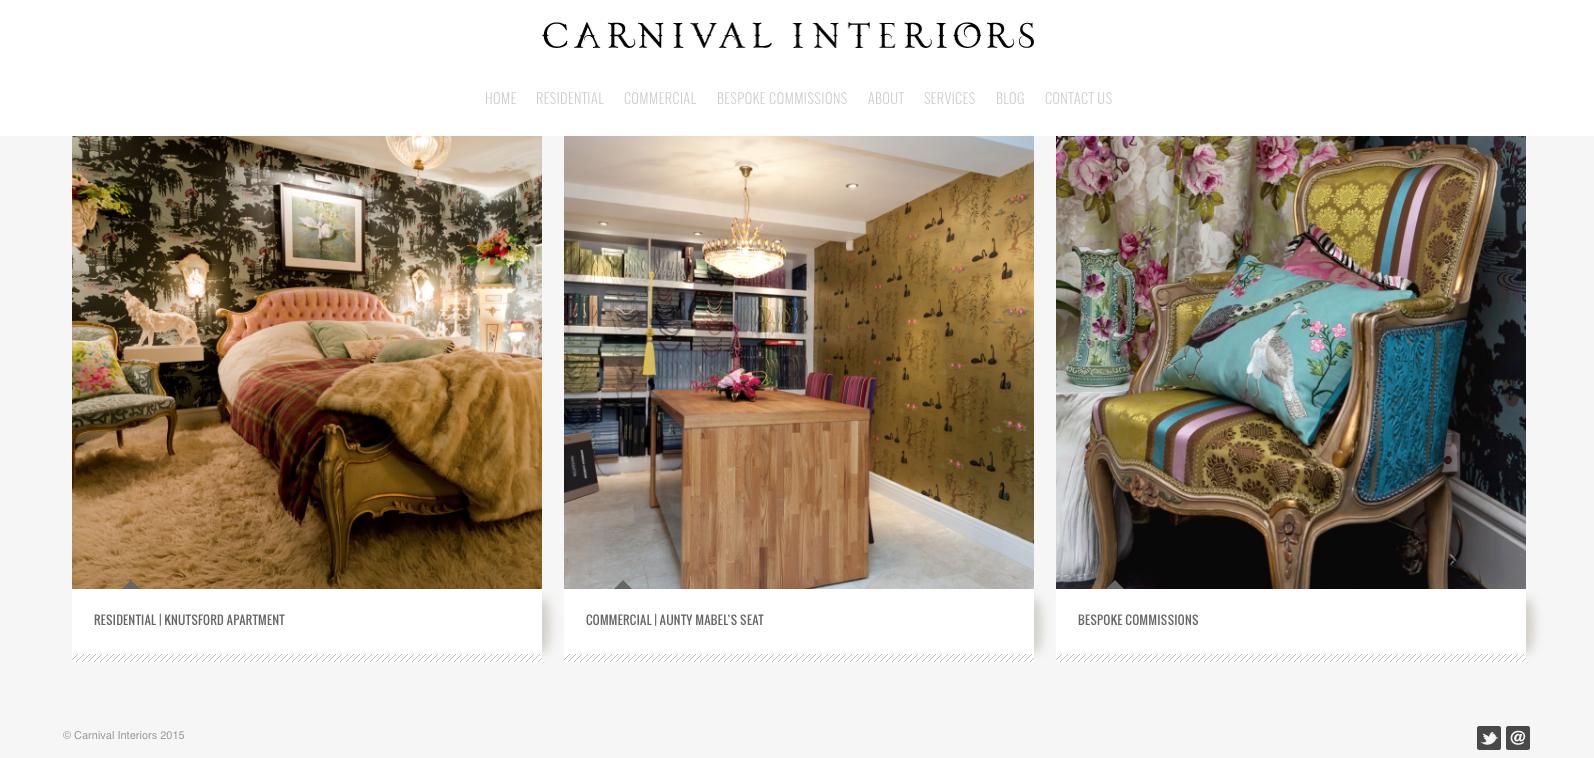 Carnival Interiors, Knutsford, website designed by Damsel in Design